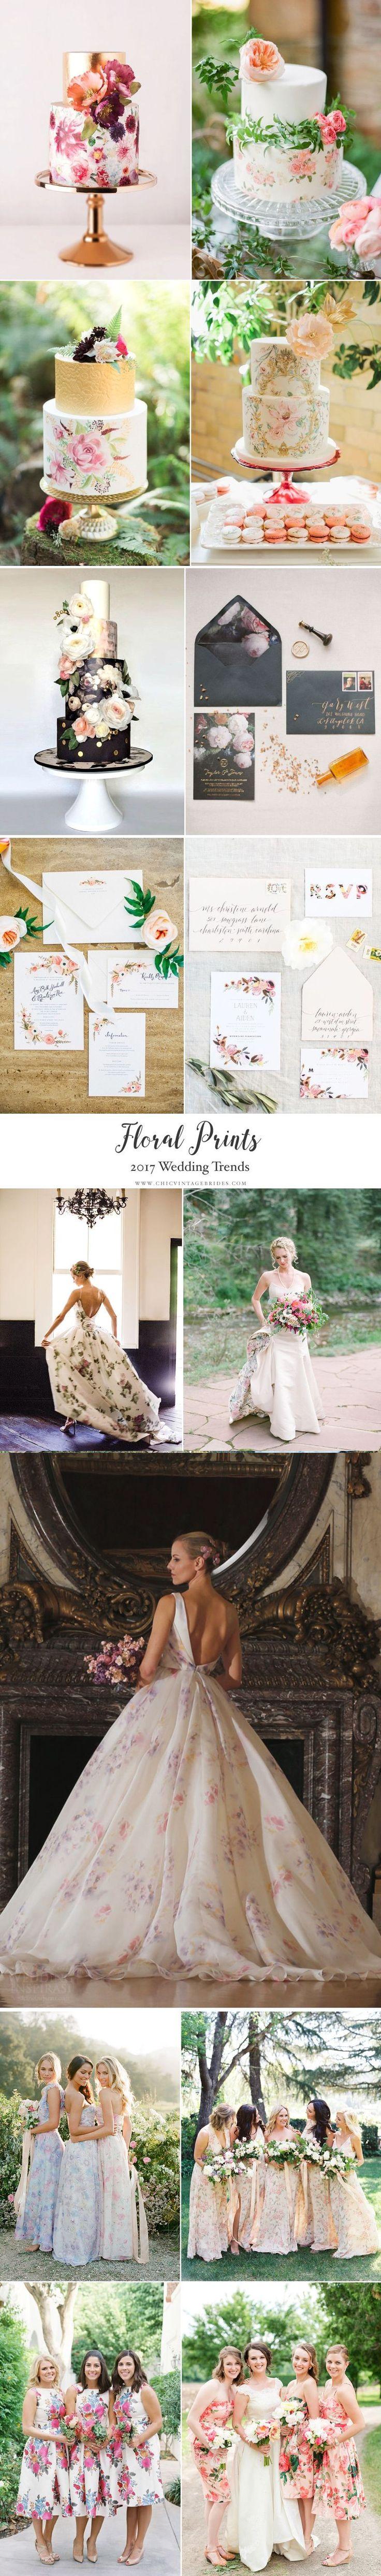 262 best Wedding Inspiration images on Pinterest | Wedding blog ...